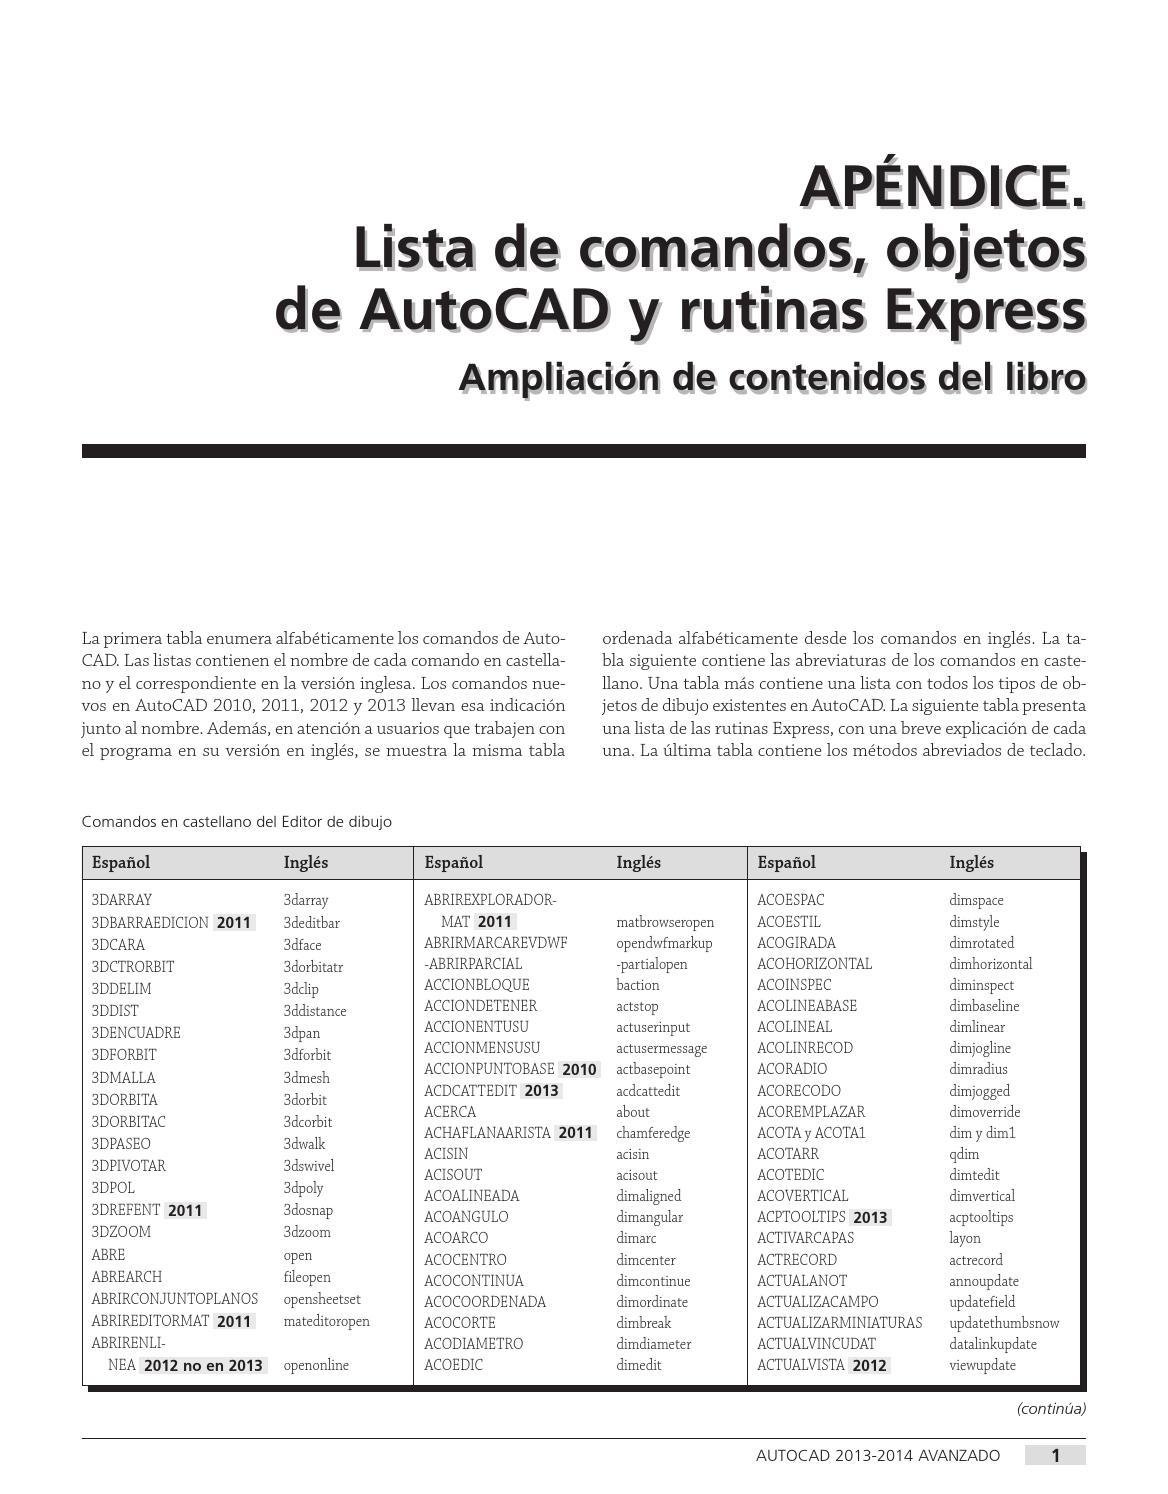 COMANDOS DE AutoCAD 2015 by Gustavo Nsd Nieves - issuu